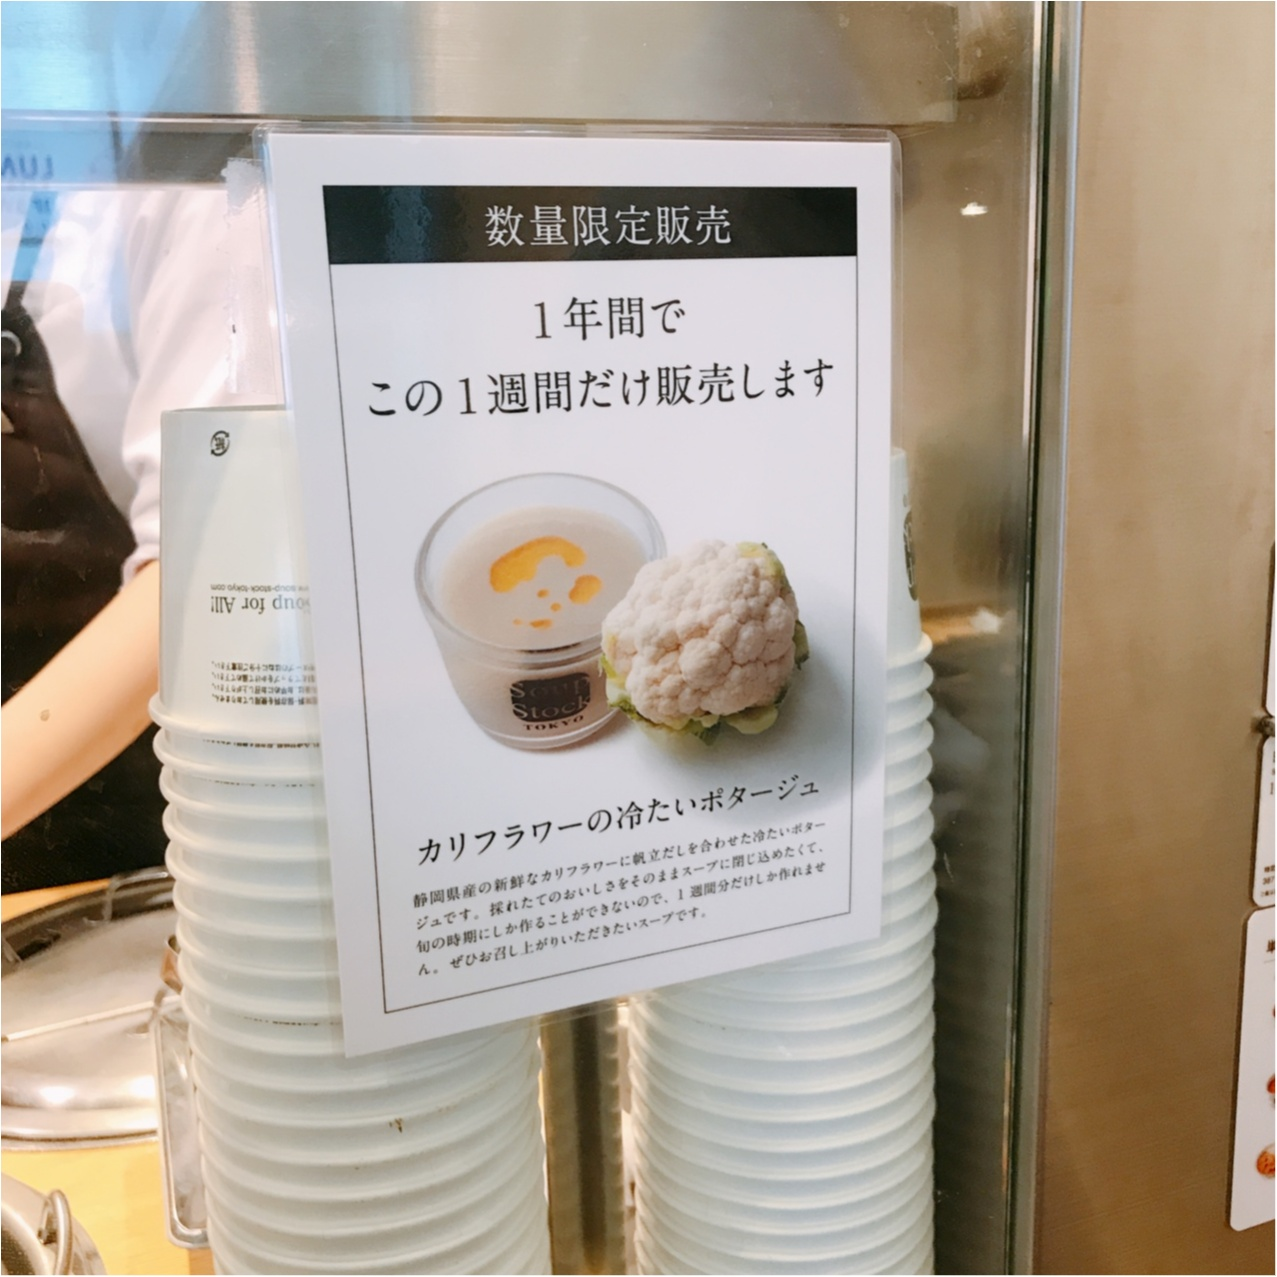 【Soup Stock Tokyo】1週間だけの限定メニュー!◯◯のポタージュが絶品♡_1